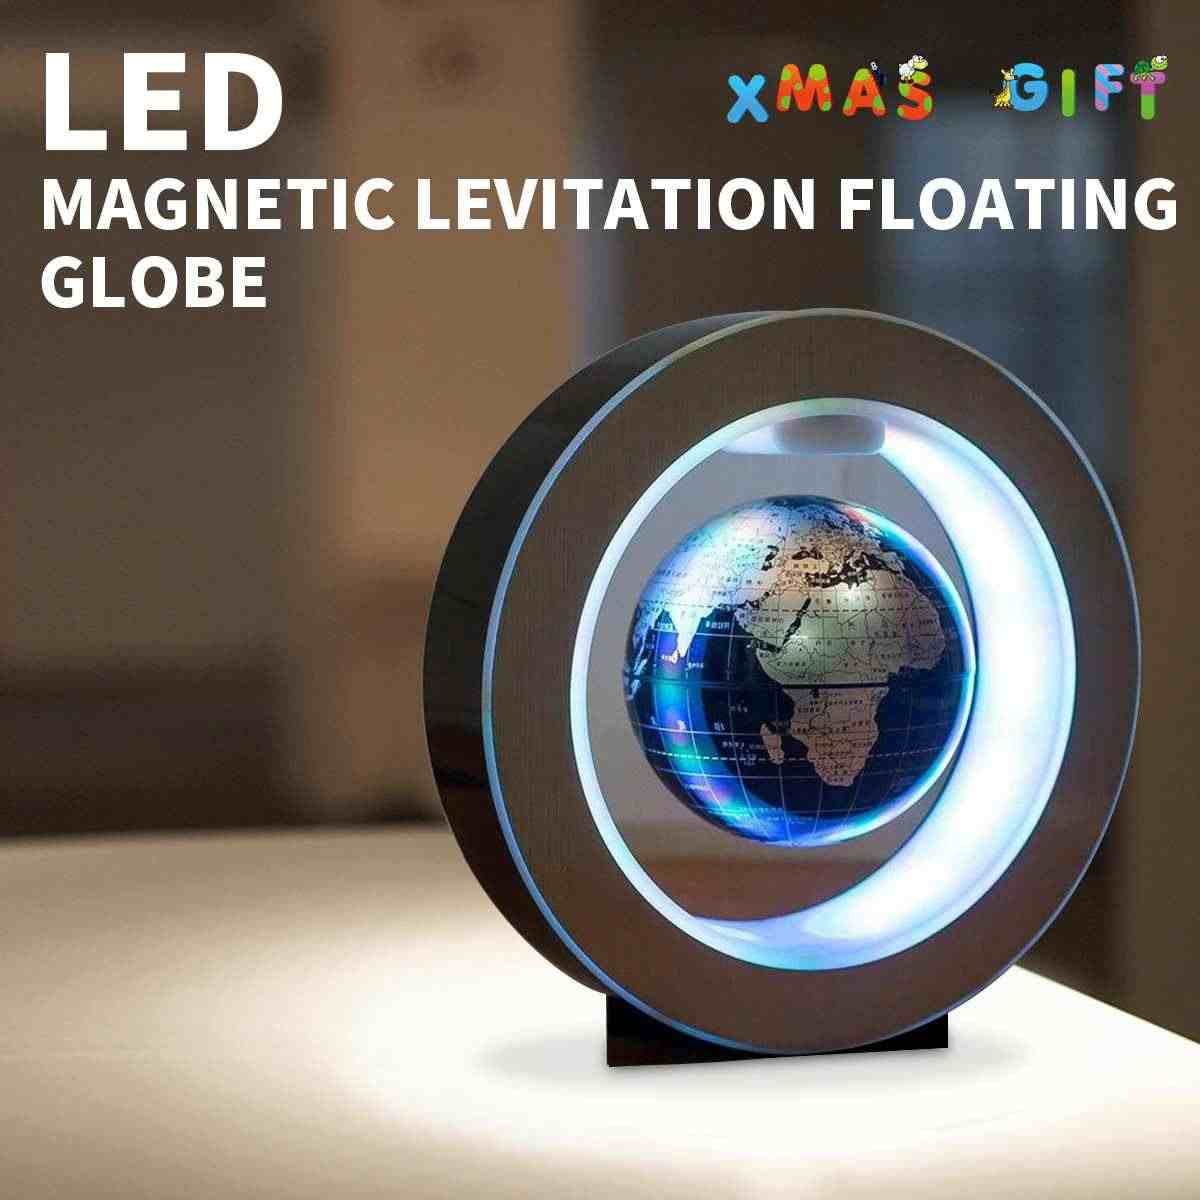 Eu Gold Levitation Anti Gravity Globe Magnetic Floating Globe World Map Led Light For Children Gift Home Office Desk Decoration In Short Supply Home